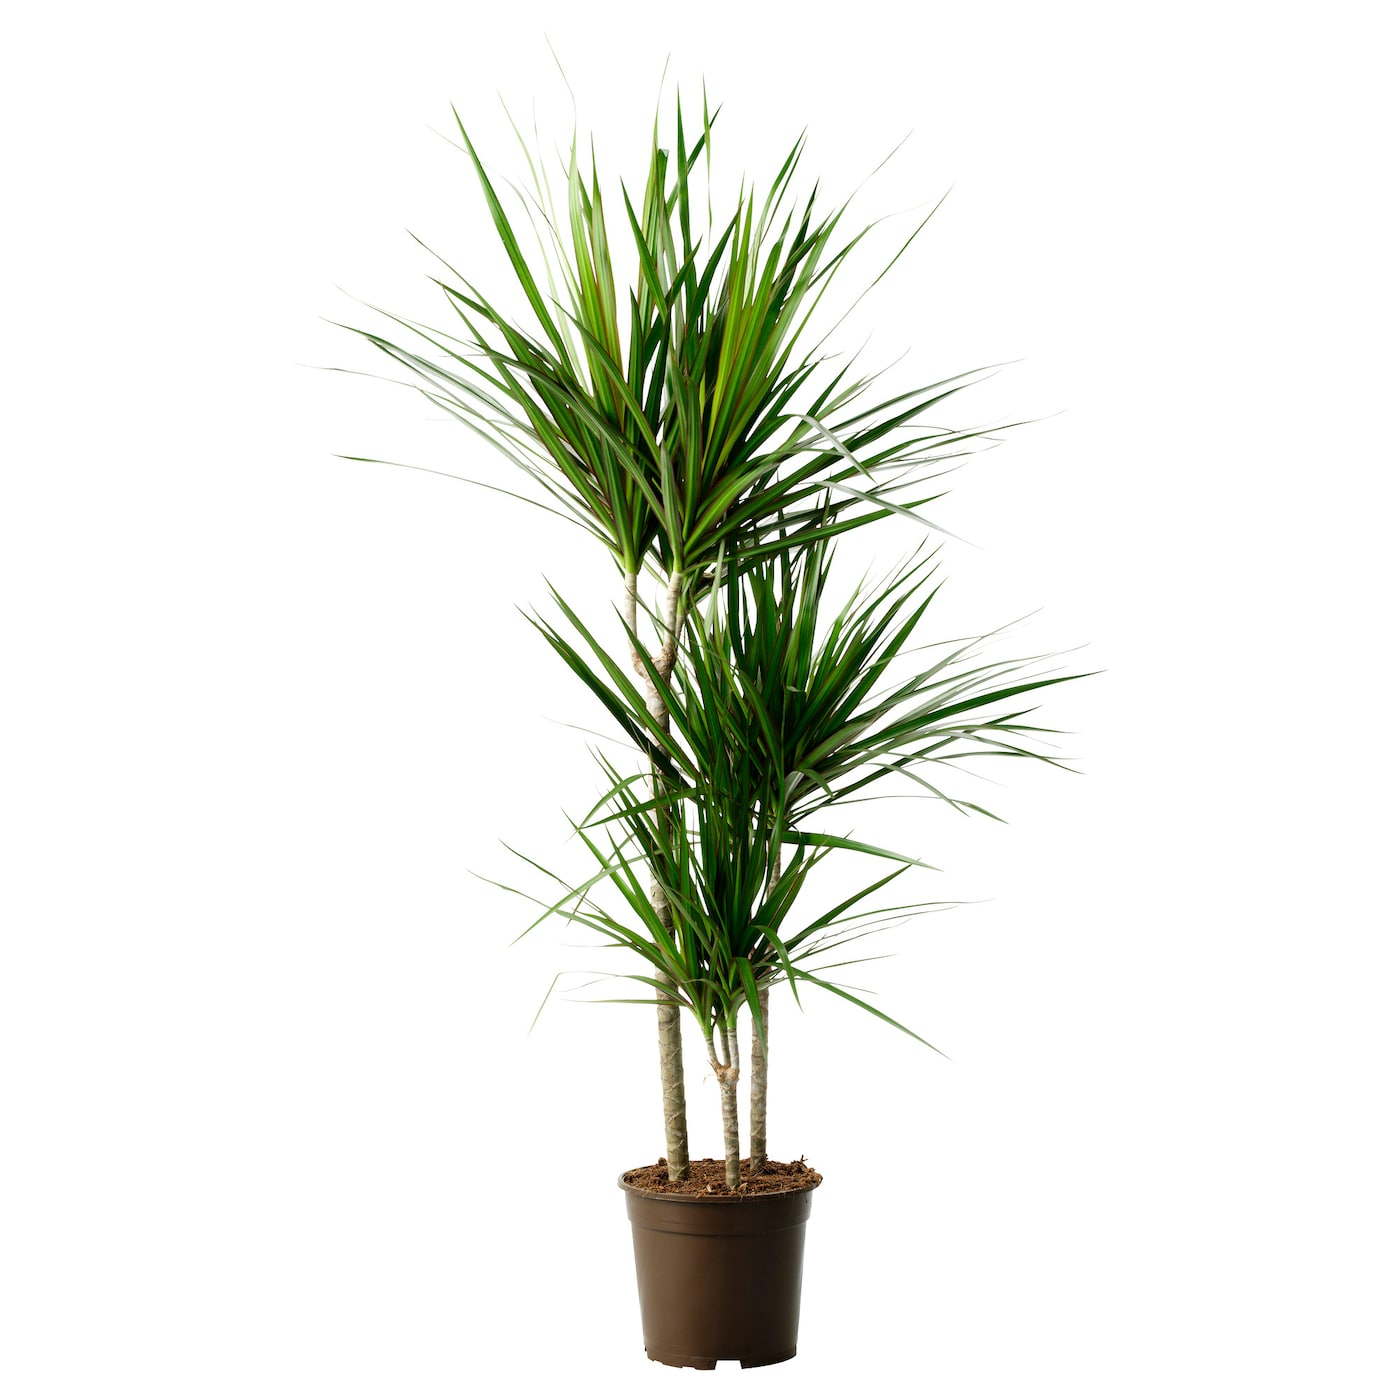 http://www.ikea.com/ie/en/images/products/dracaena-marginata-potted-plant-dragon-tree-3-stem__67436_pe181279_s5.jpg Dracaena